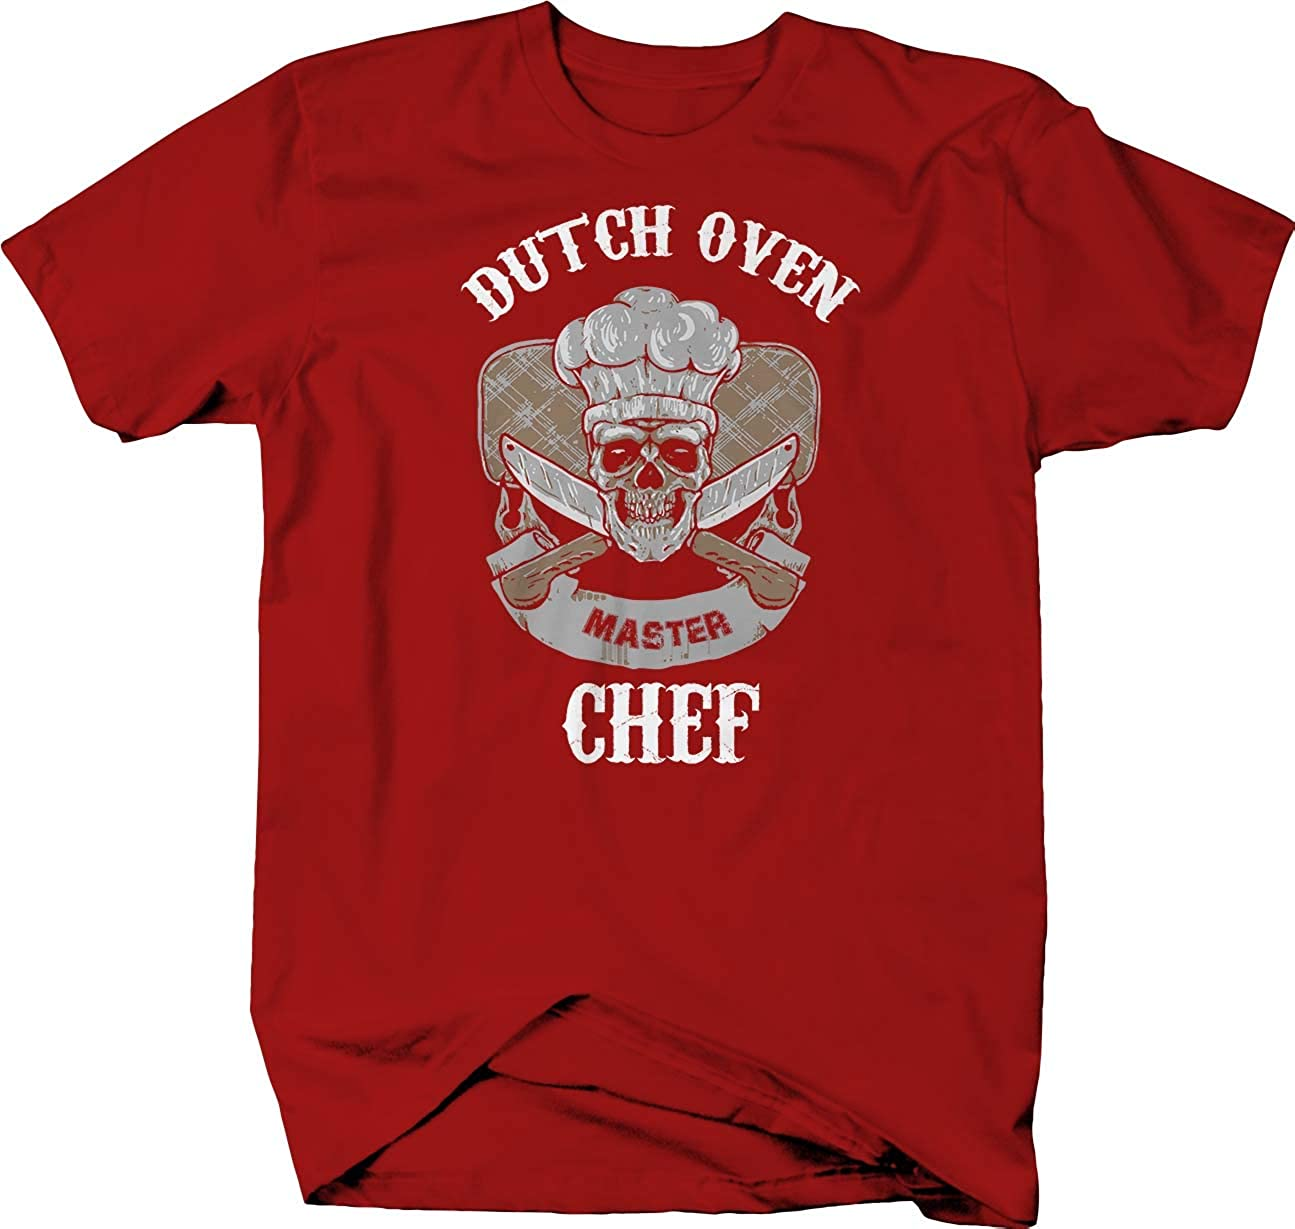 Dutch Oven Master Chef T-Shirt